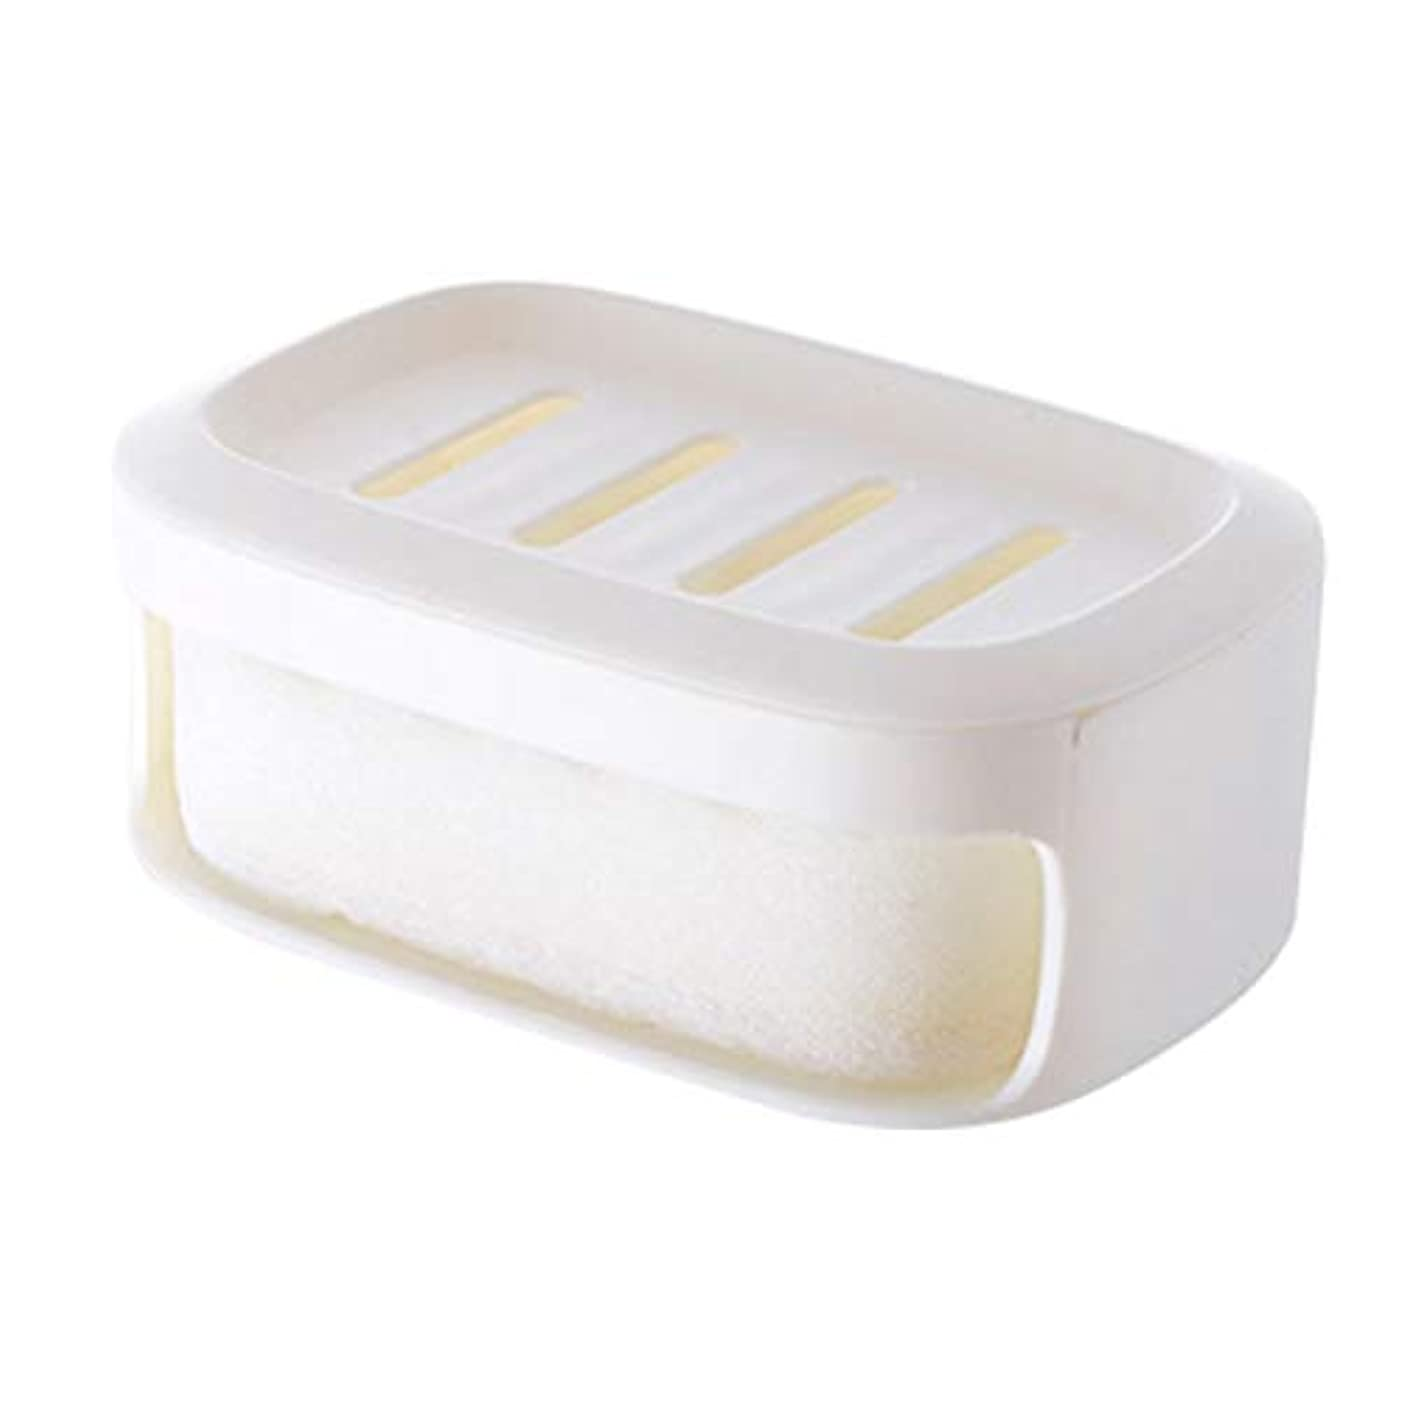 Healifty ソープボックス二重層防水シールソープコンテナバスルームソープ収納ケース(ホワイト)